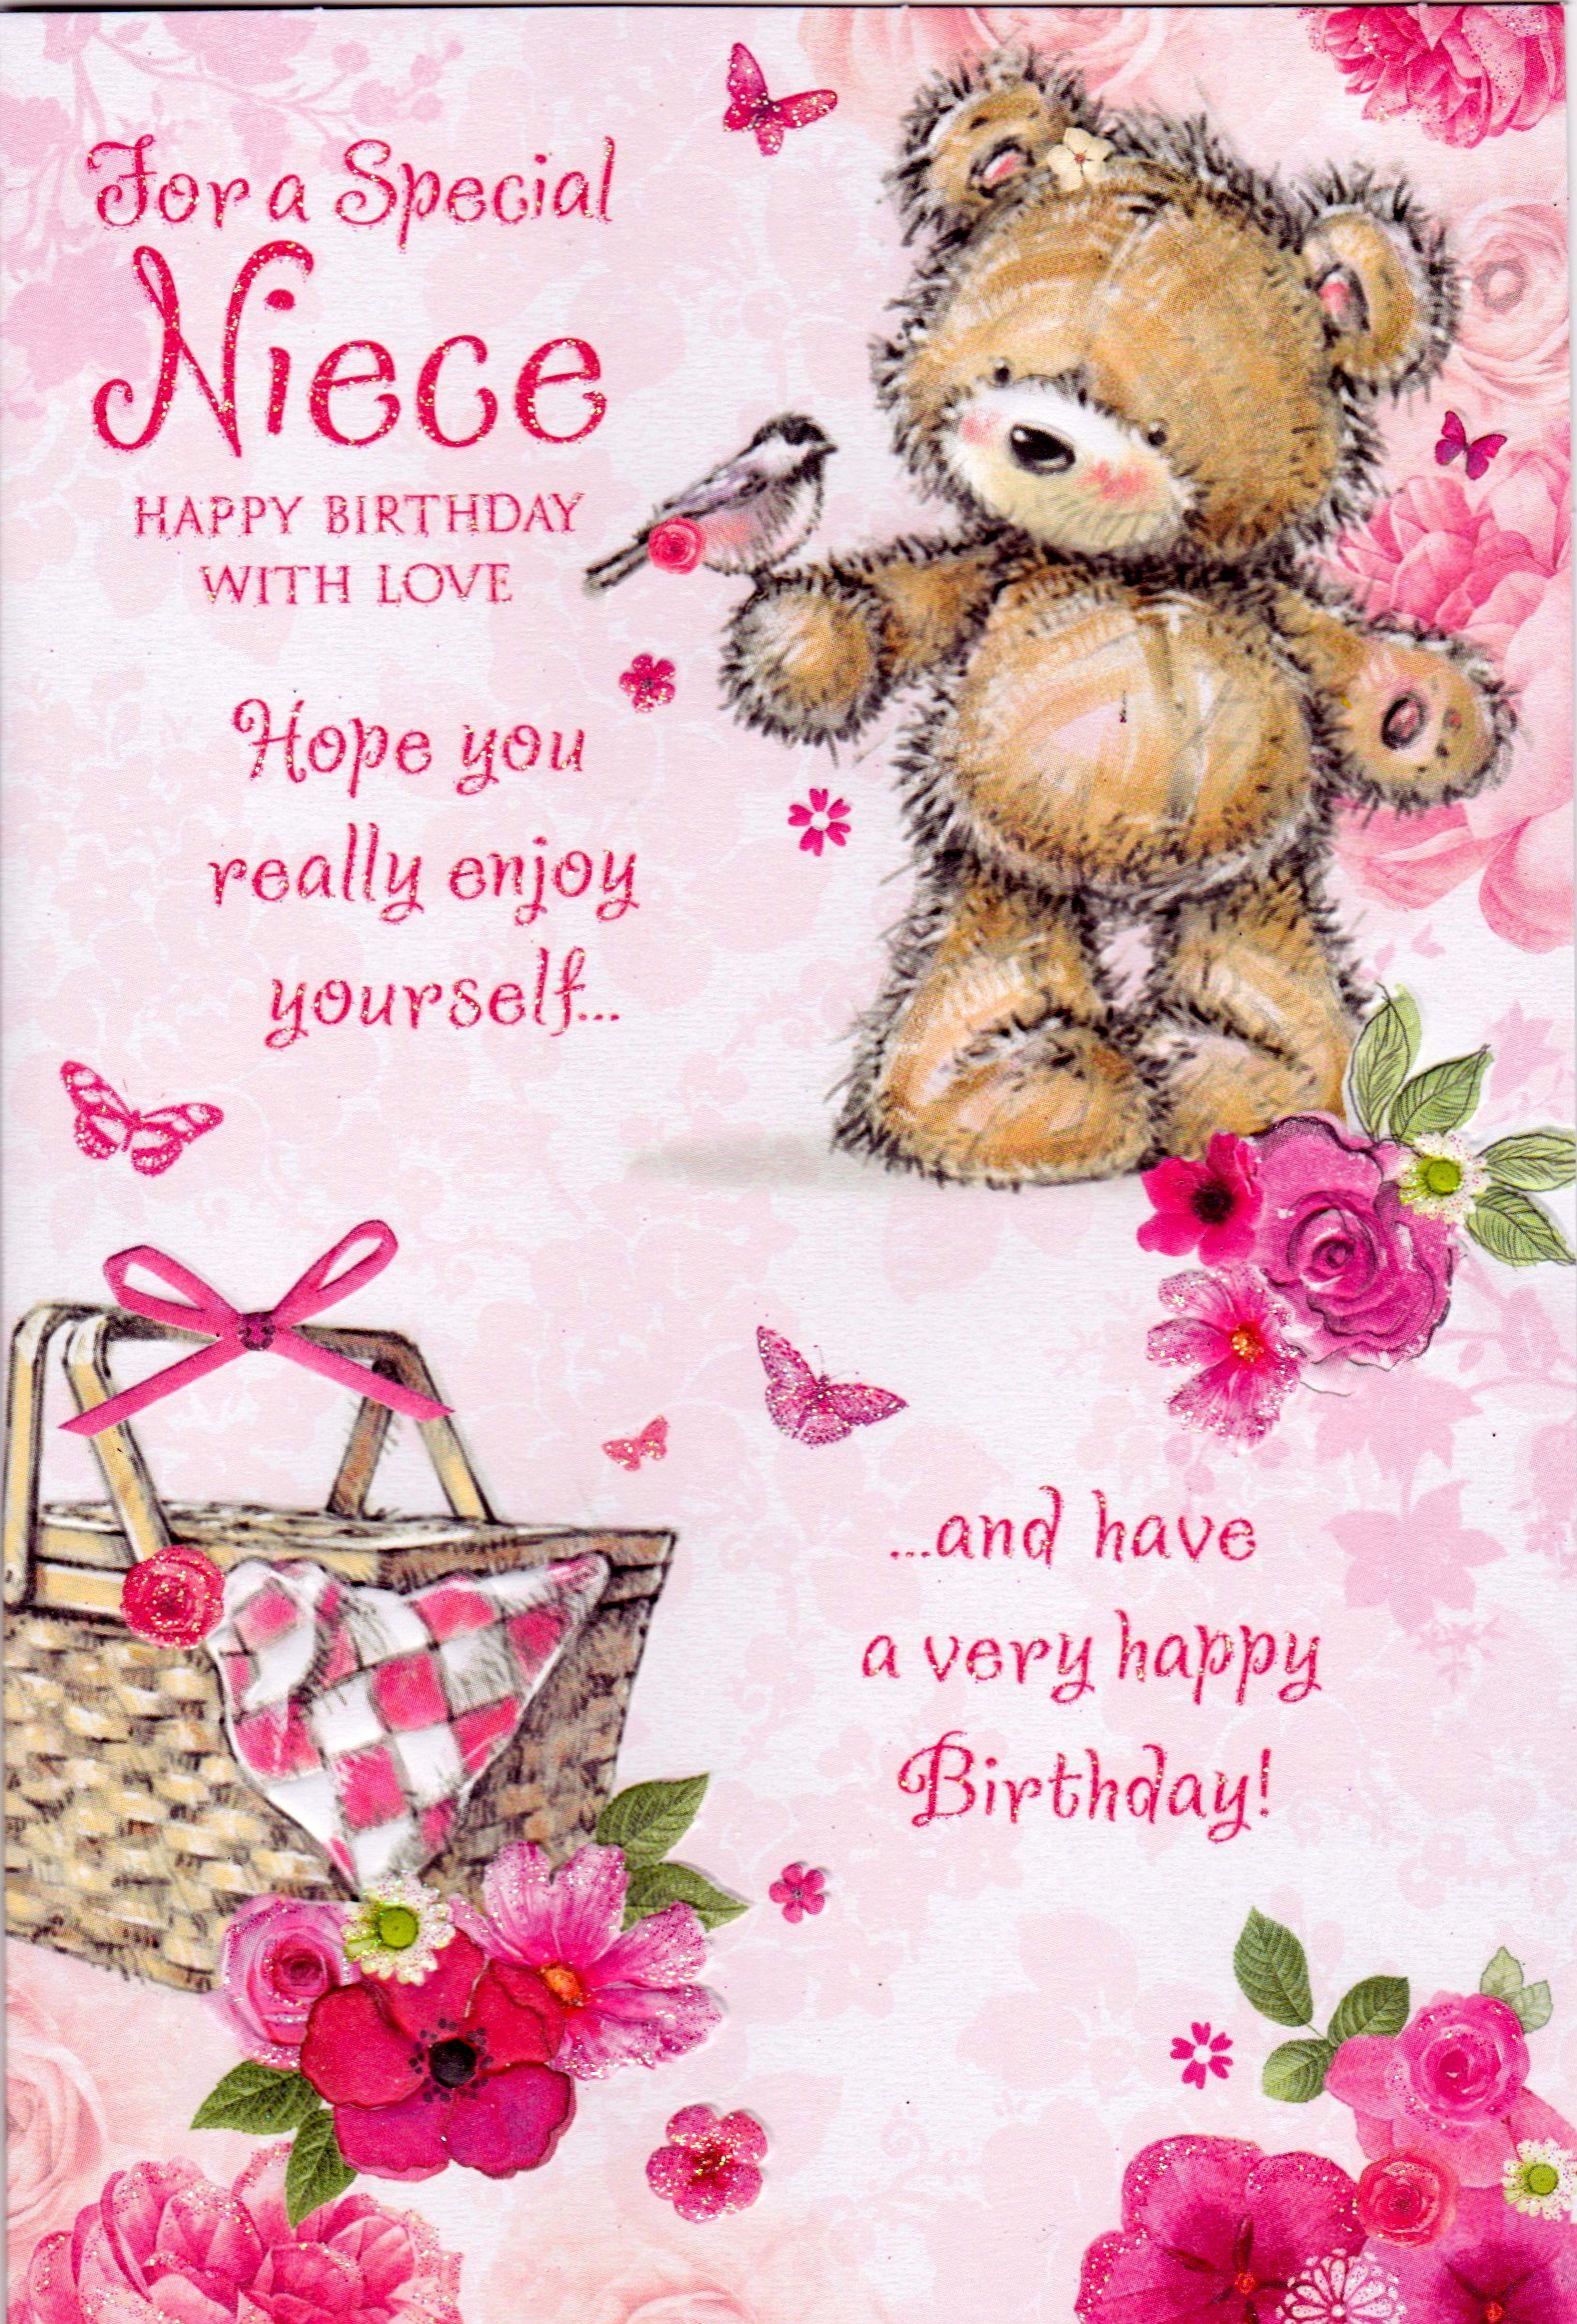 Niece Birthday Card Shower Wedding Pinterest – Niece Birthday Greetings